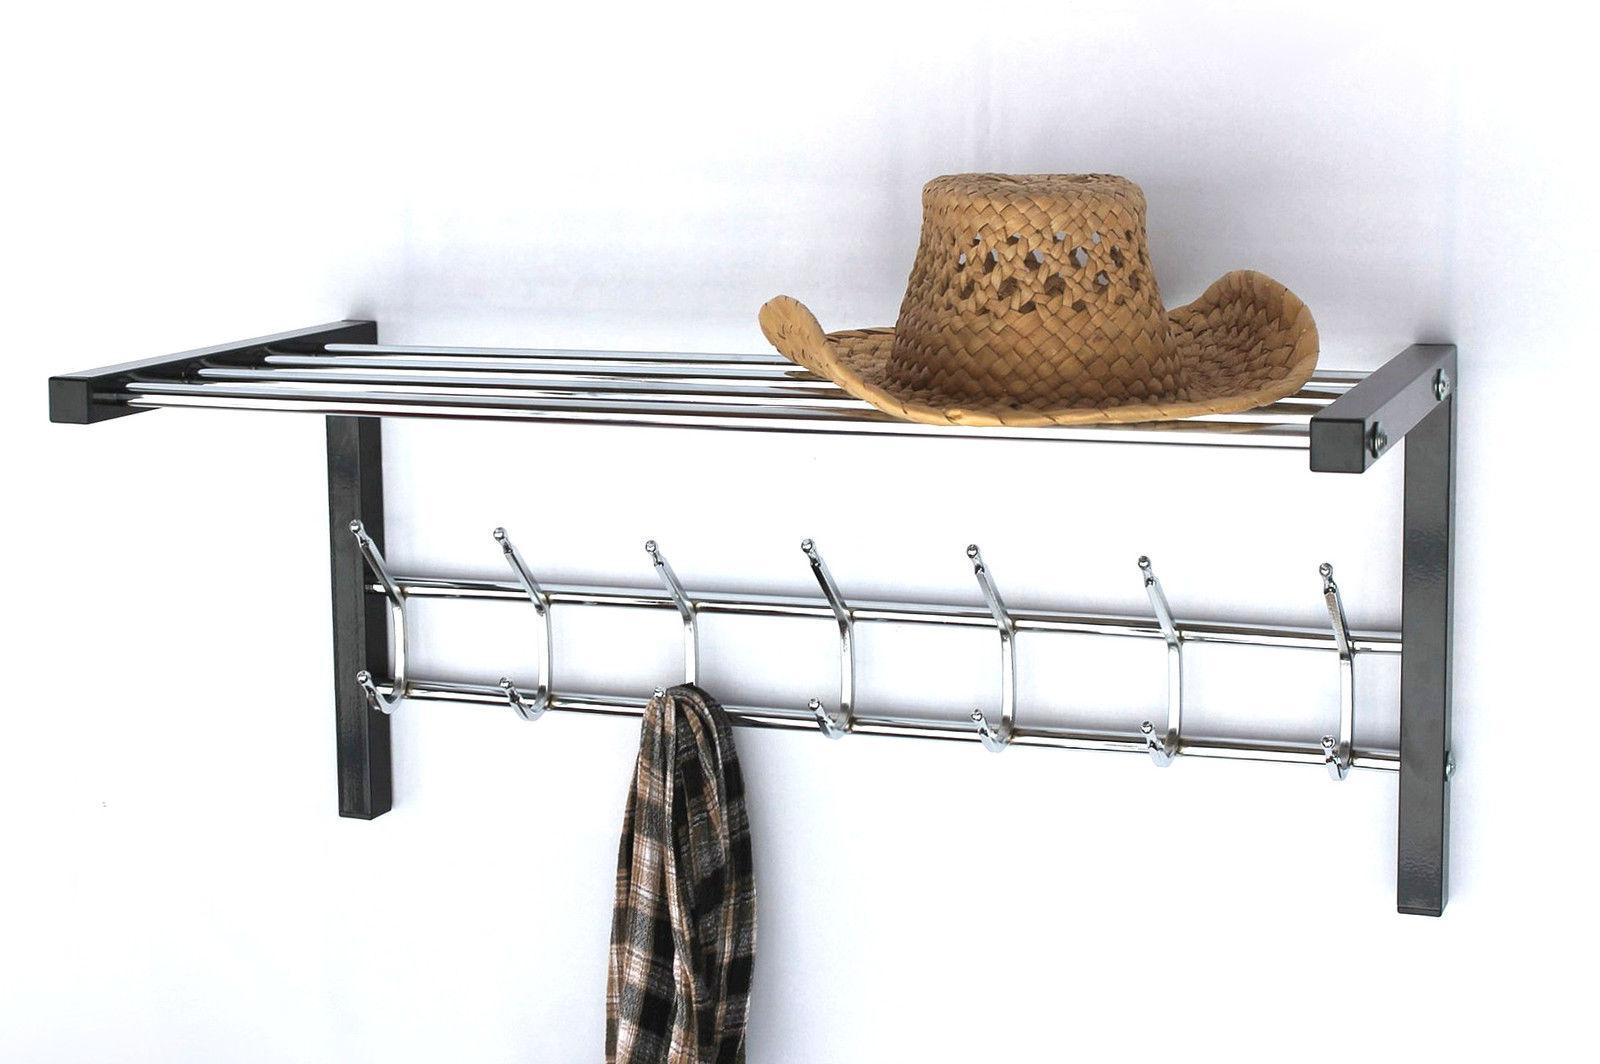 wandgarderobe mit hutablage metall. Black Bedroom Furniture Sets. Home Design Ideas